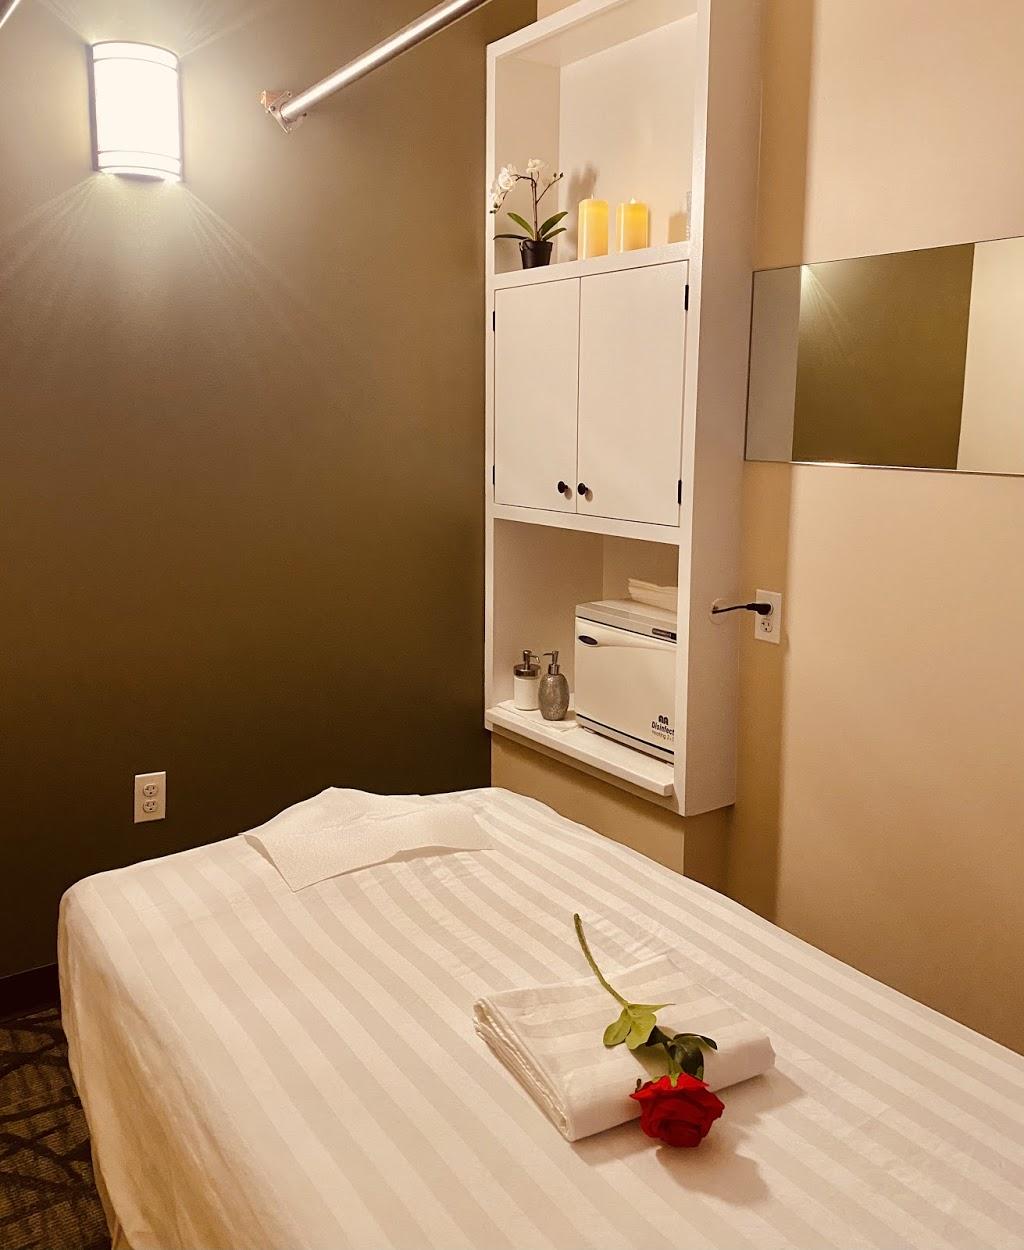 Massage Crystal - spa    Photo 1 of 7   Address: 13919 Baltimore Ave # 6, Laurel, MD 20707, USA   Phone: (202) 428-9177